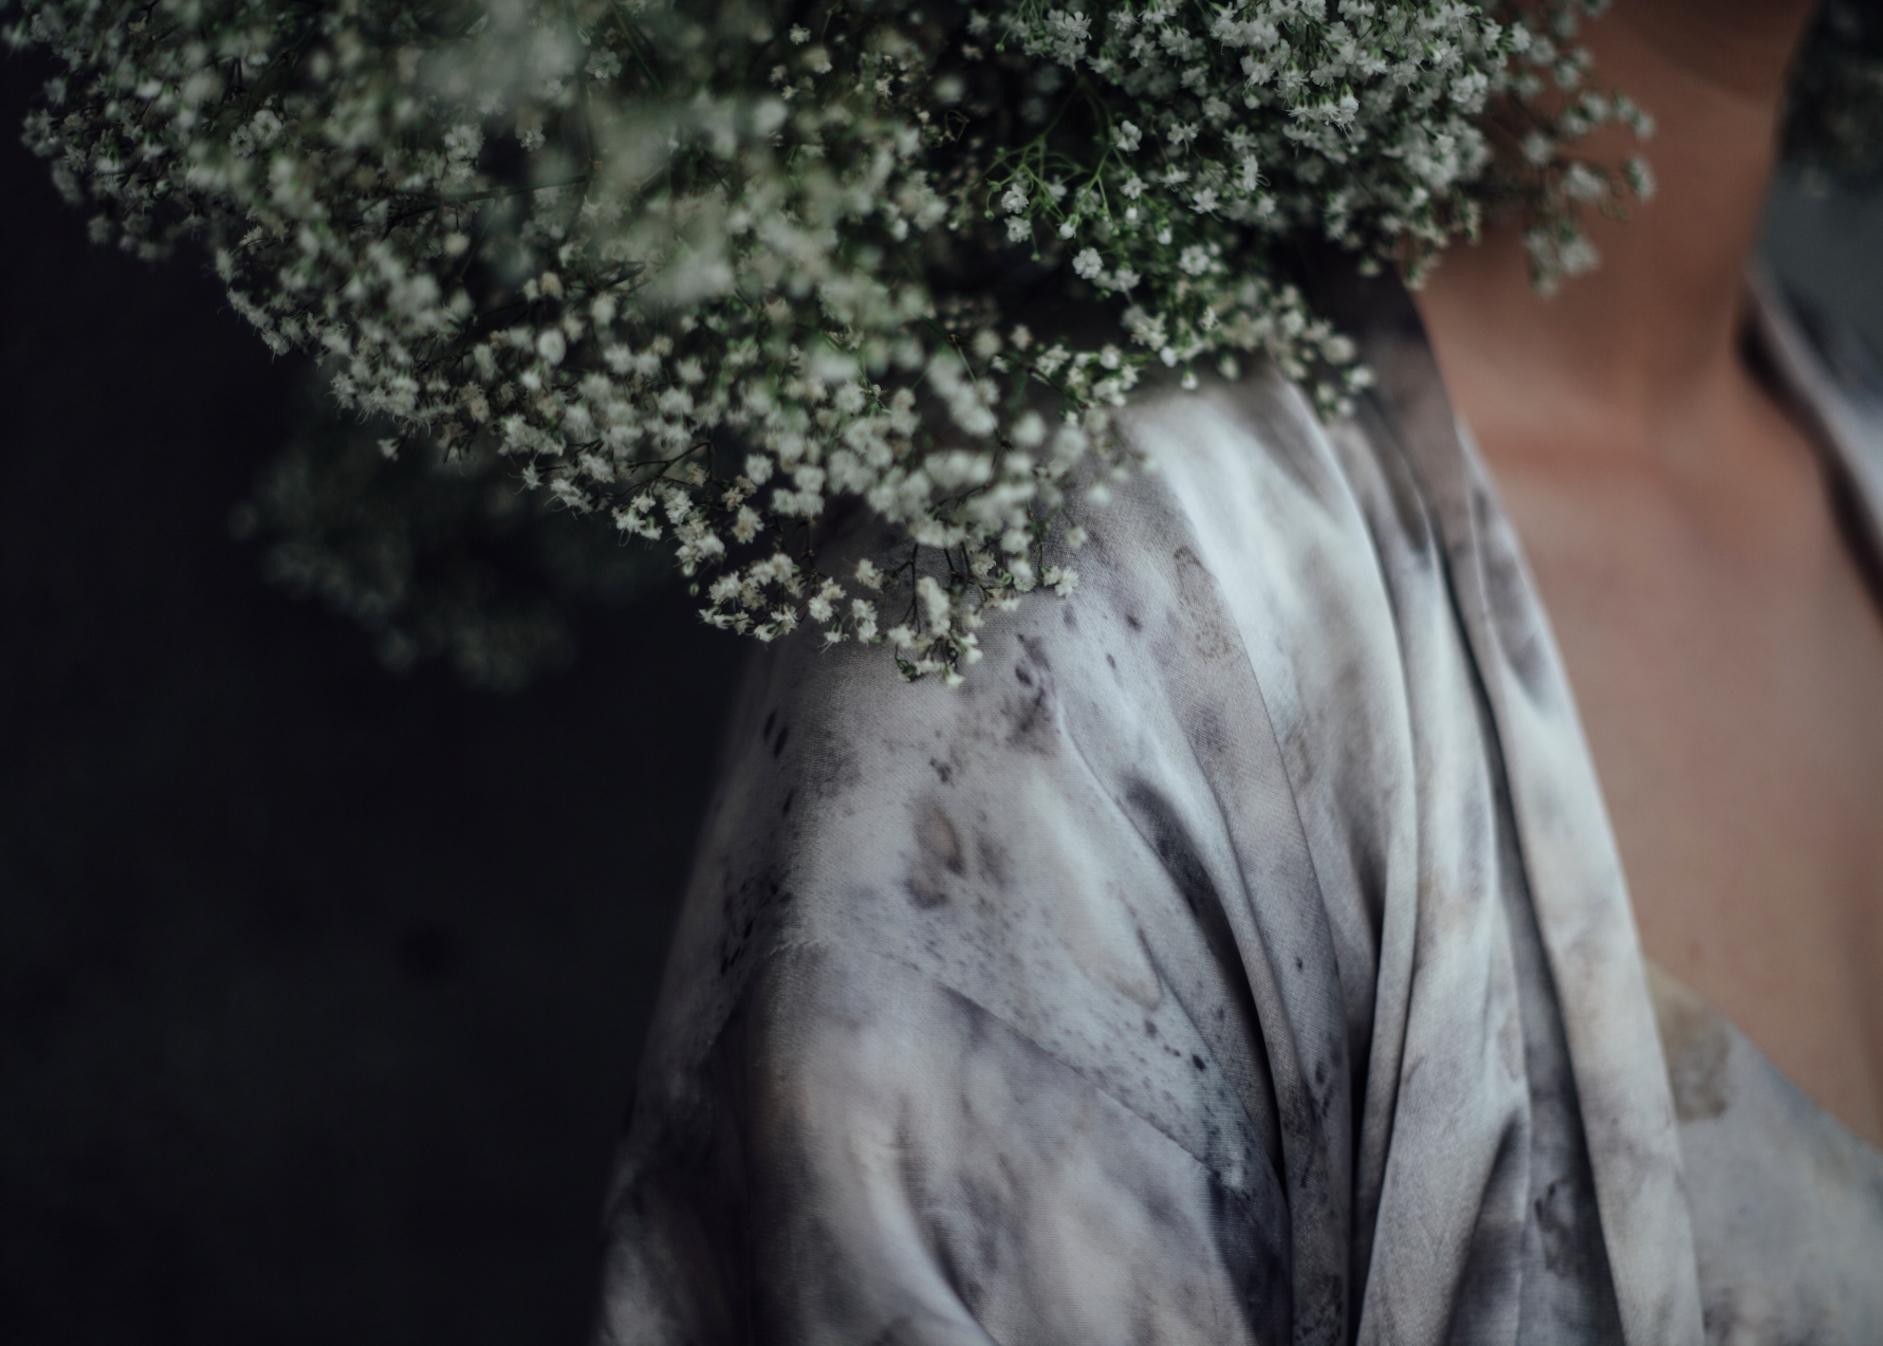 koebenhavns-plantefarveri-flowerscape-collection.JPG